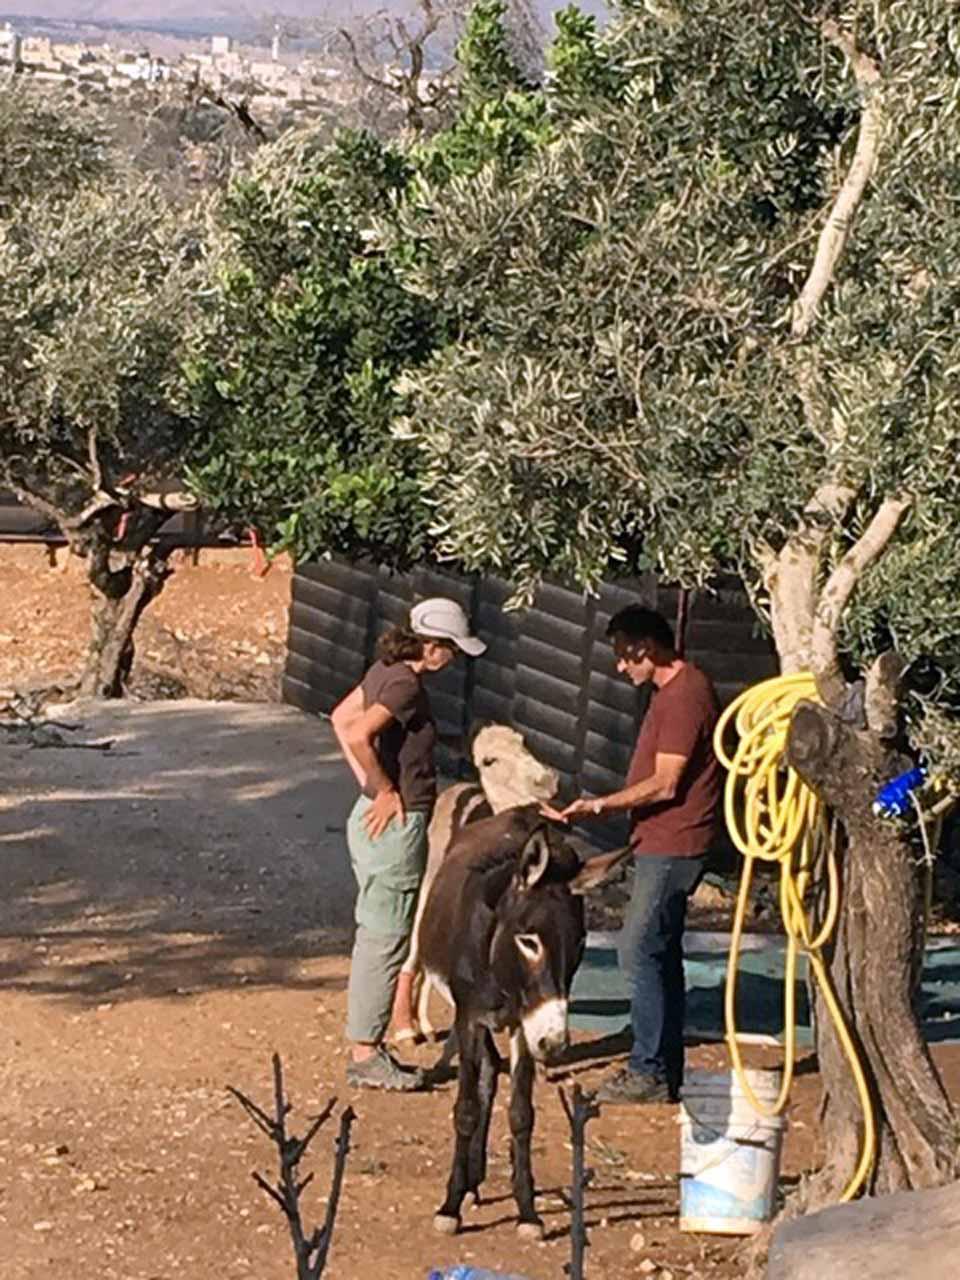 Megan McAlister Rudholm, Hilu (white donkey), Habiba (brown donkey) and Maad Abu-Ghazalah, at Daily Hugz, Asira al-Shimaliyah, Palestine